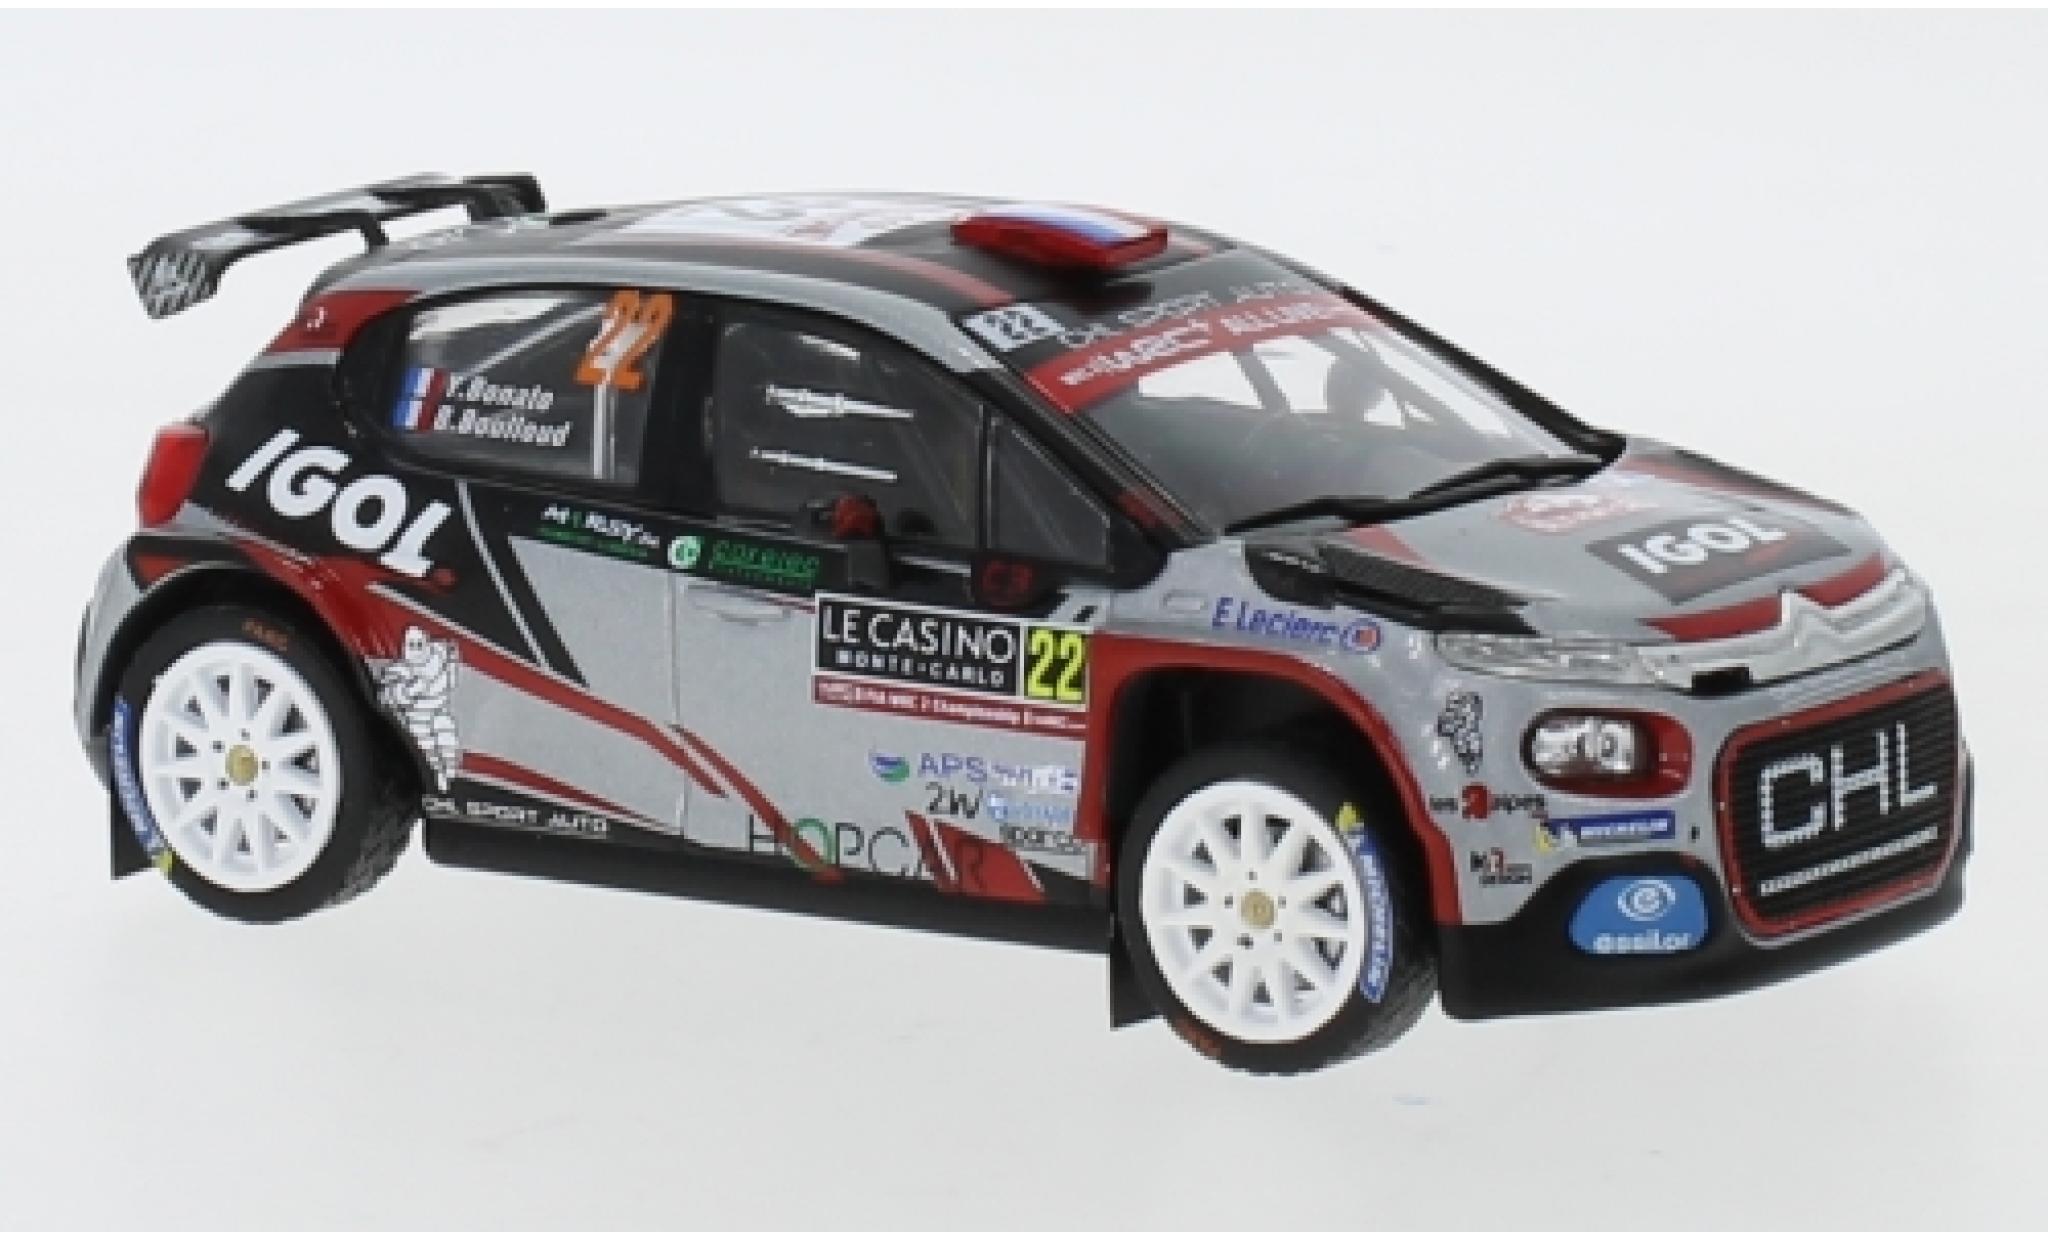 Citroen C3 1/43 IXO R5 No.22 CHL Sport Auto IGOL Rallye Monte Carlo 2019 Y.Bonato/B.Boulloud